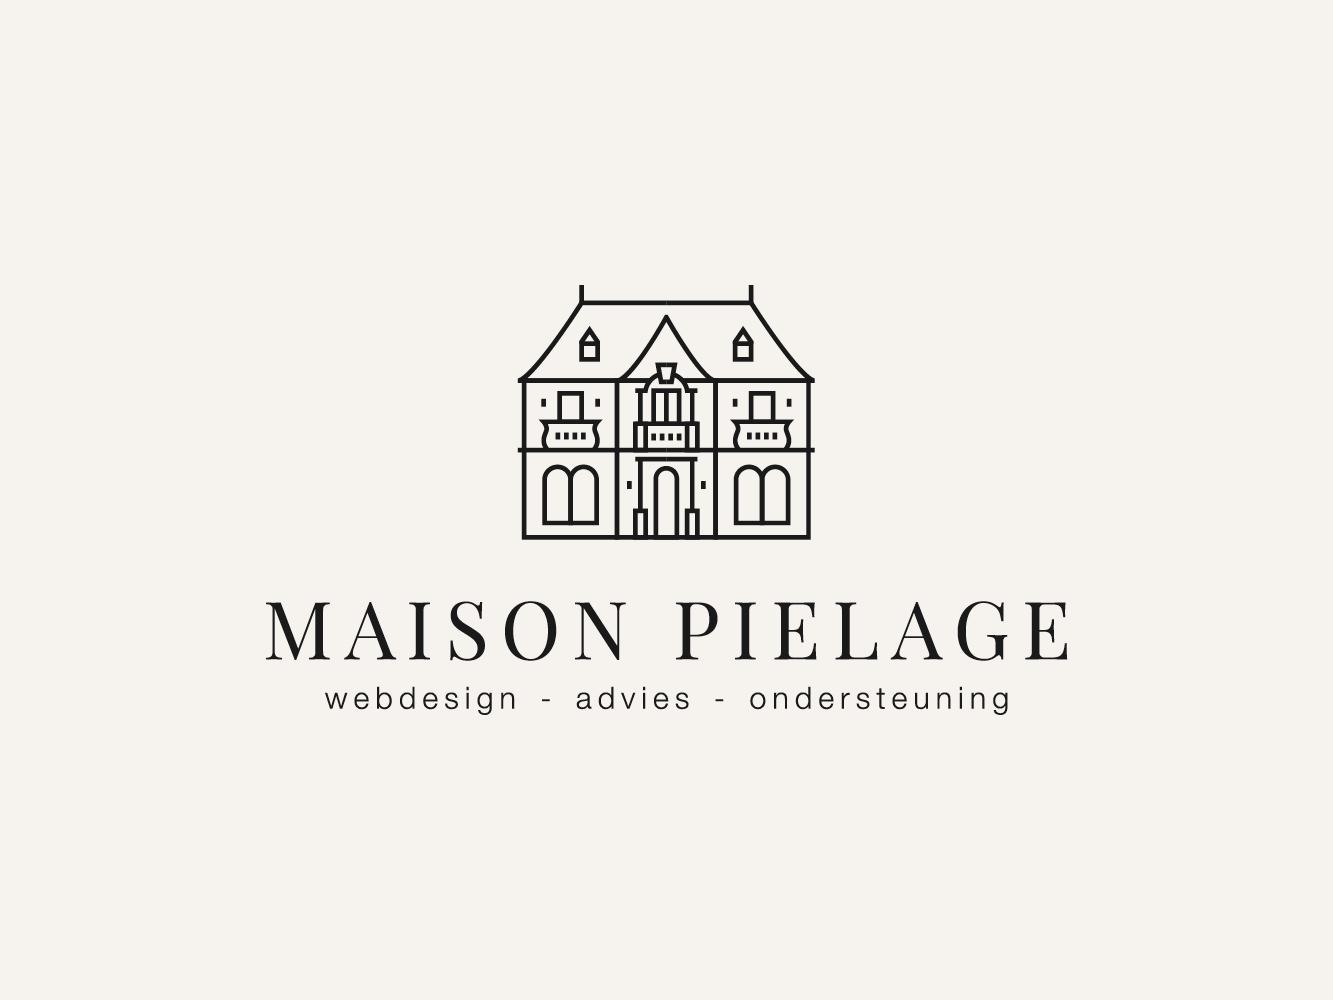 Studio Marly - Creative Agency - Maison Pielage